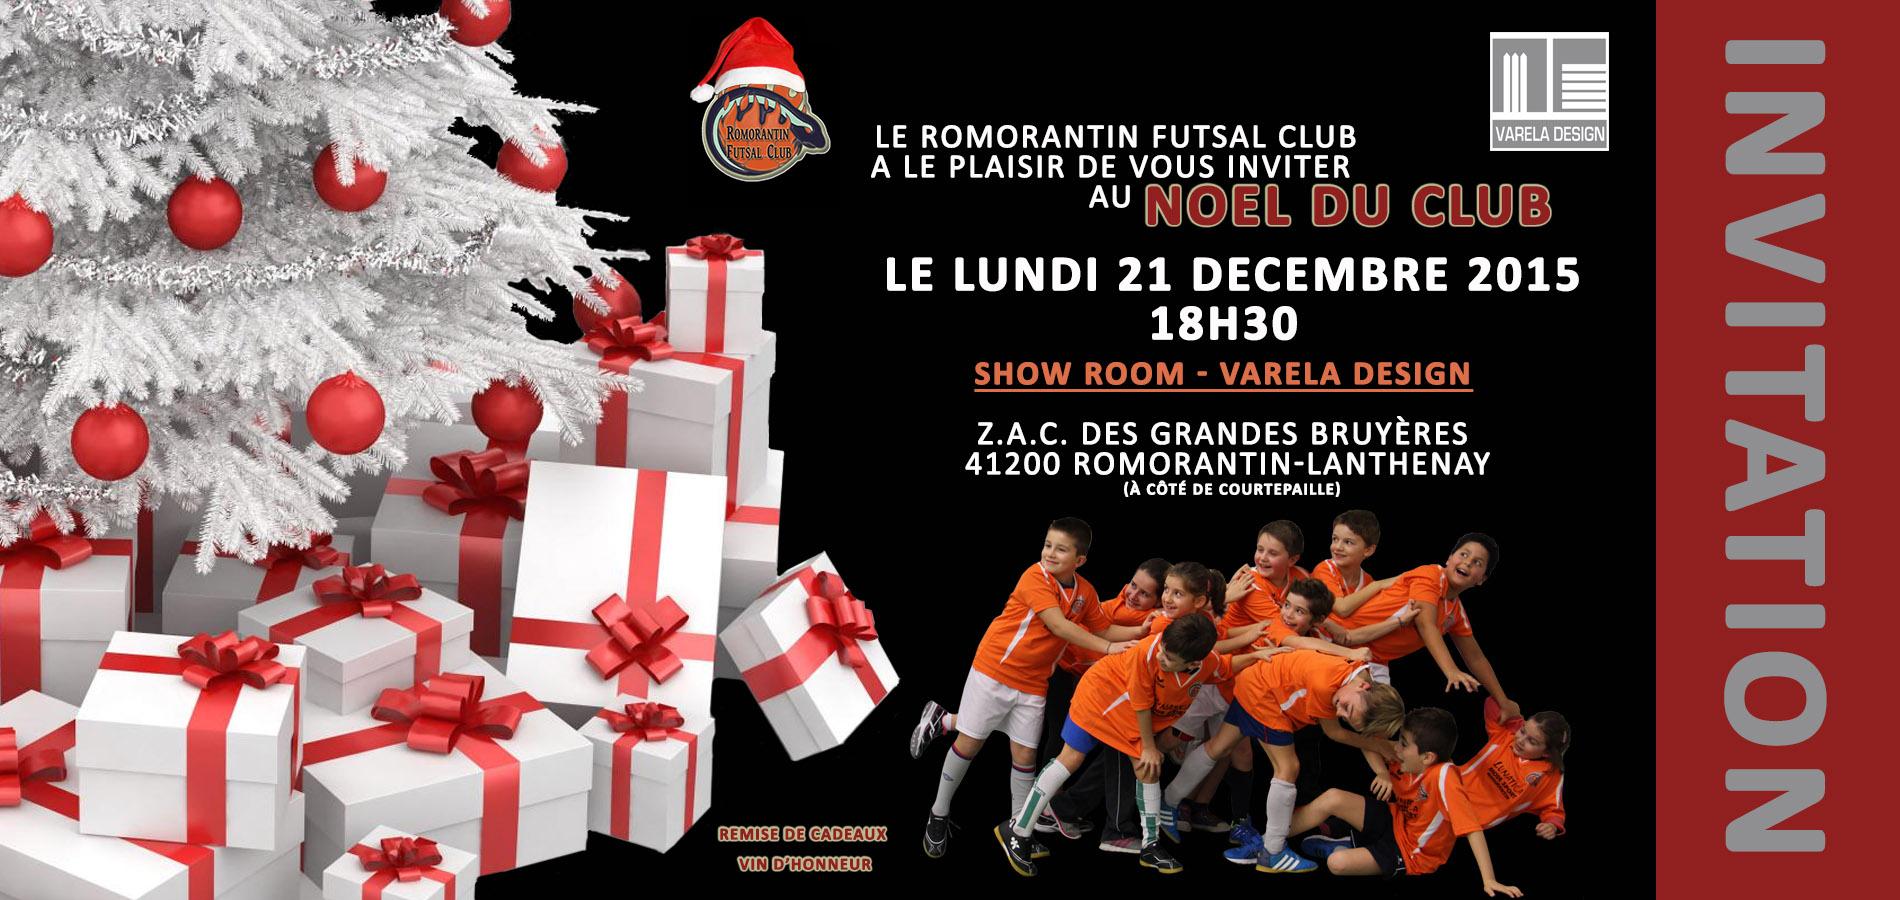 invitation noel 2015 romorantin futsal